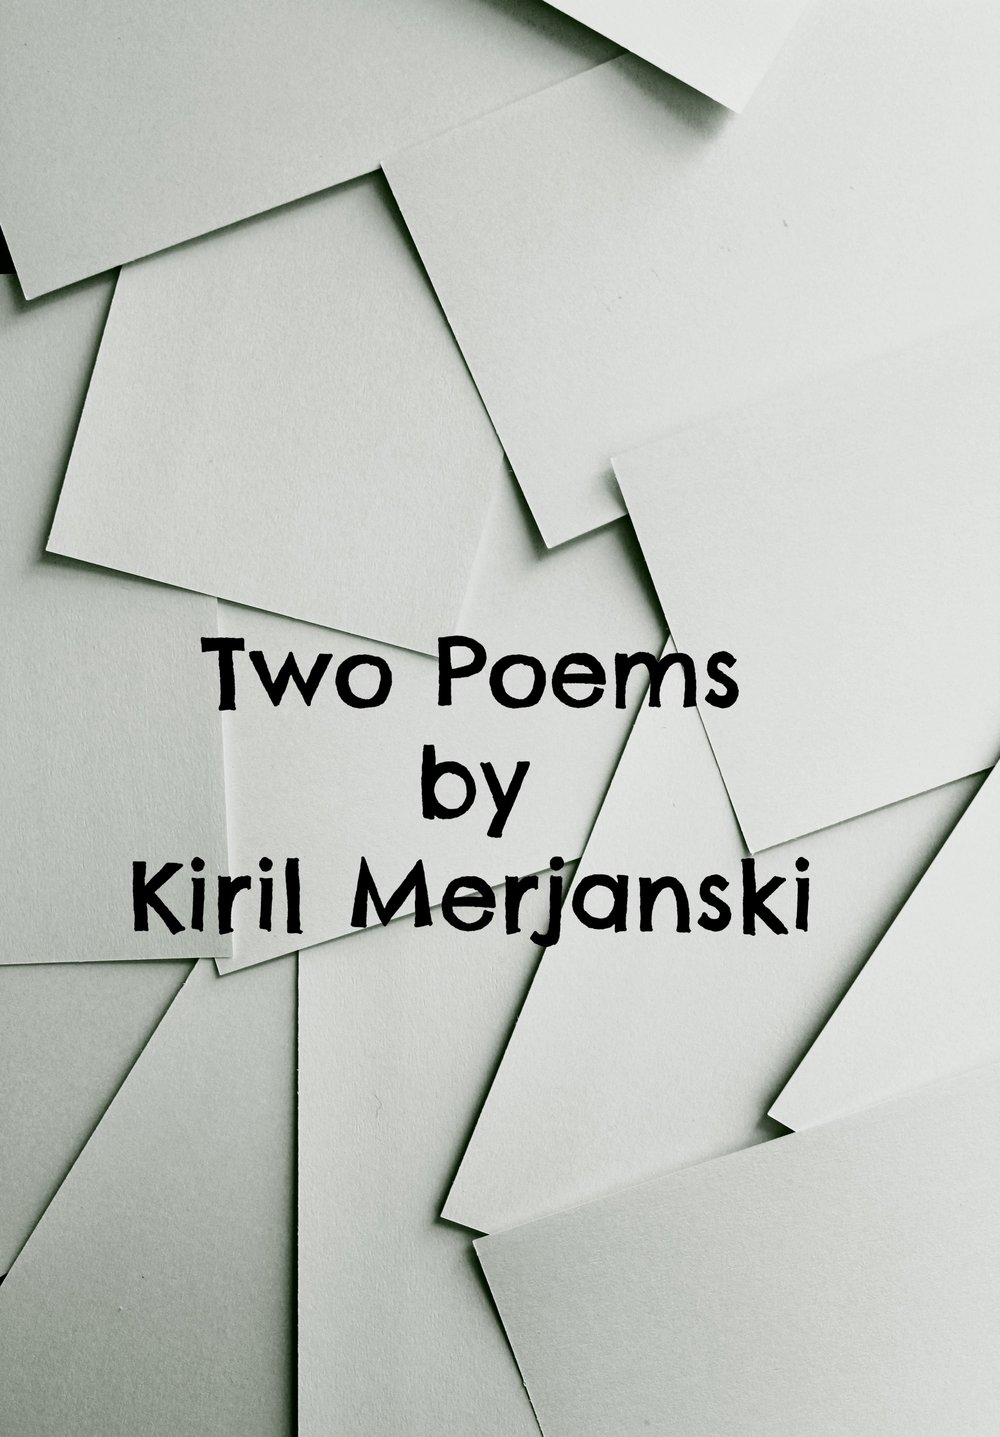 Two Poems by Kiril Merjanski